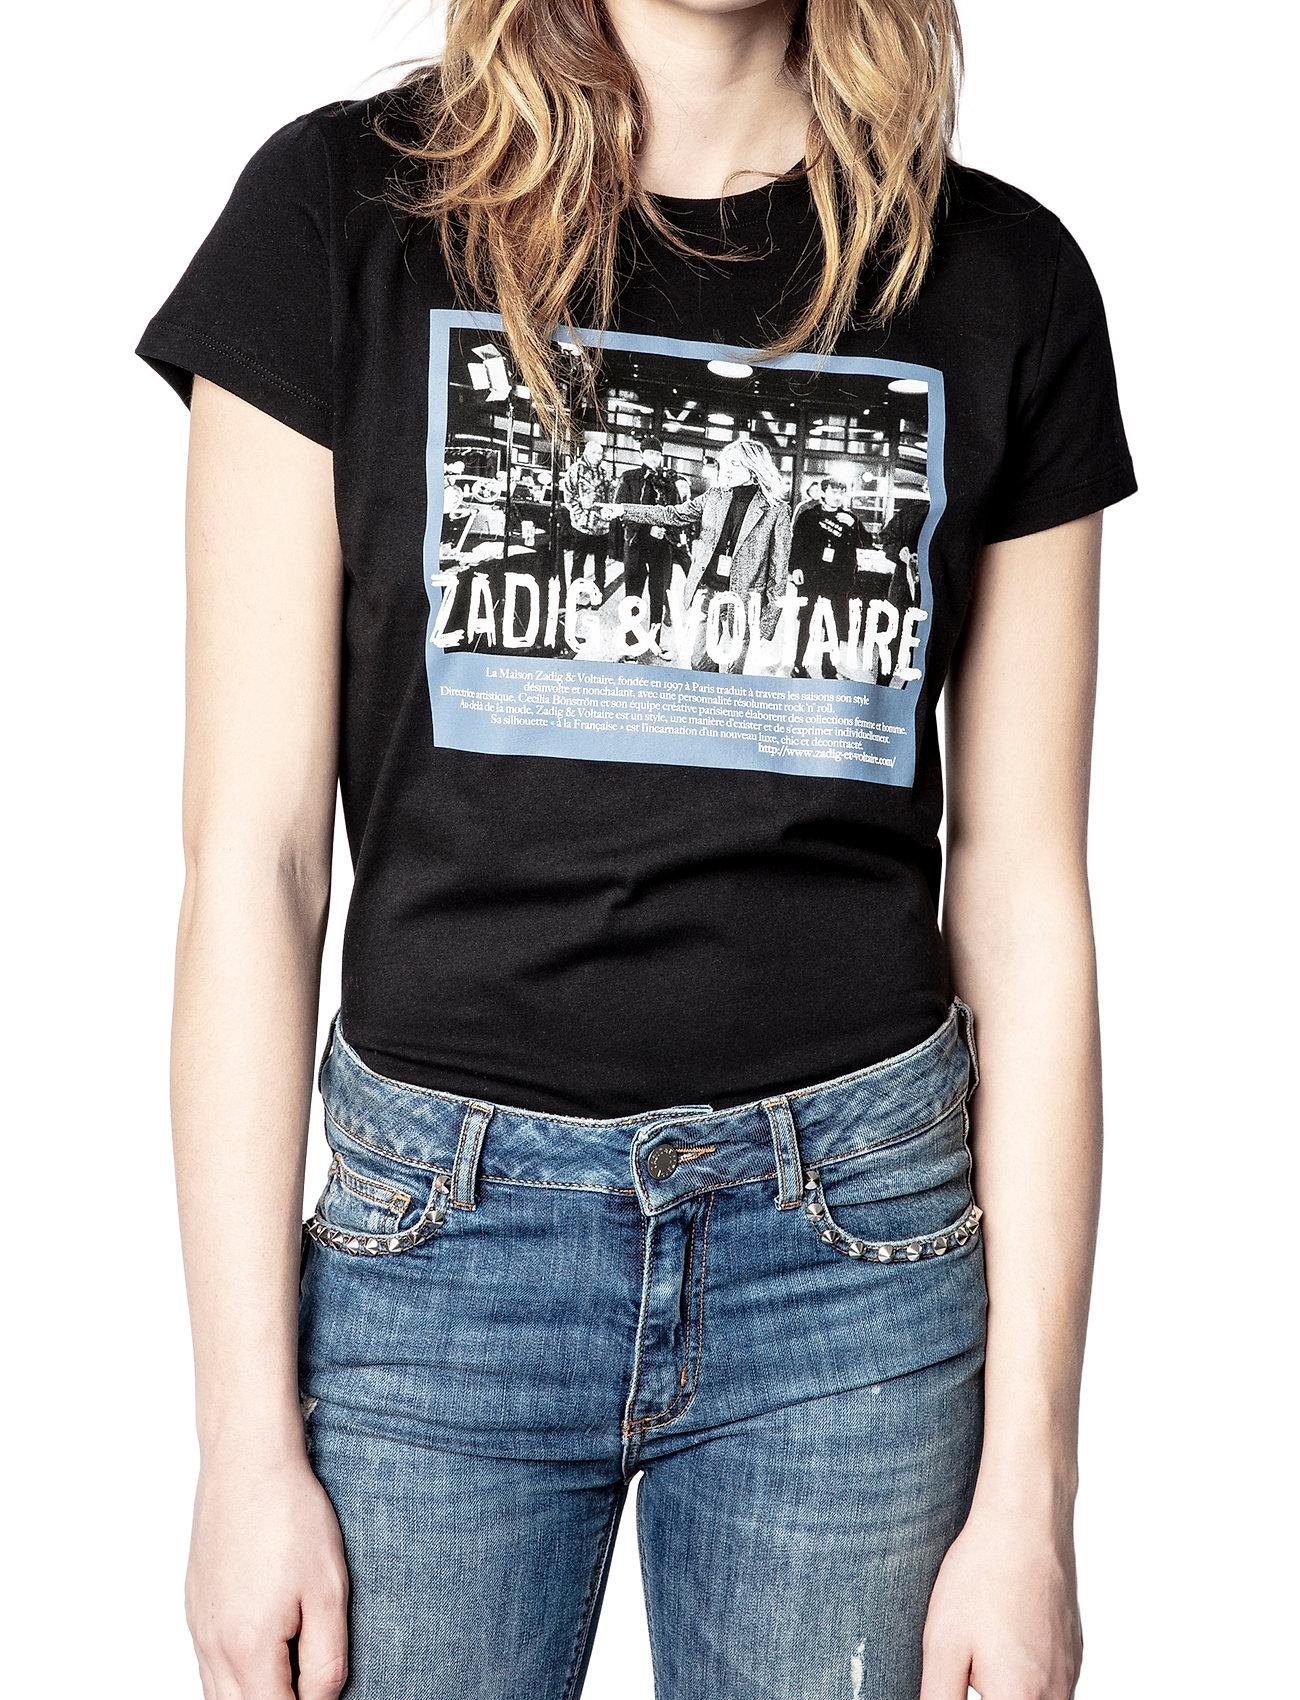 Zadig & Voltaire - ZOE PHOTOPRINT PRINTED T-SHIRT - t-shirts - black - 0